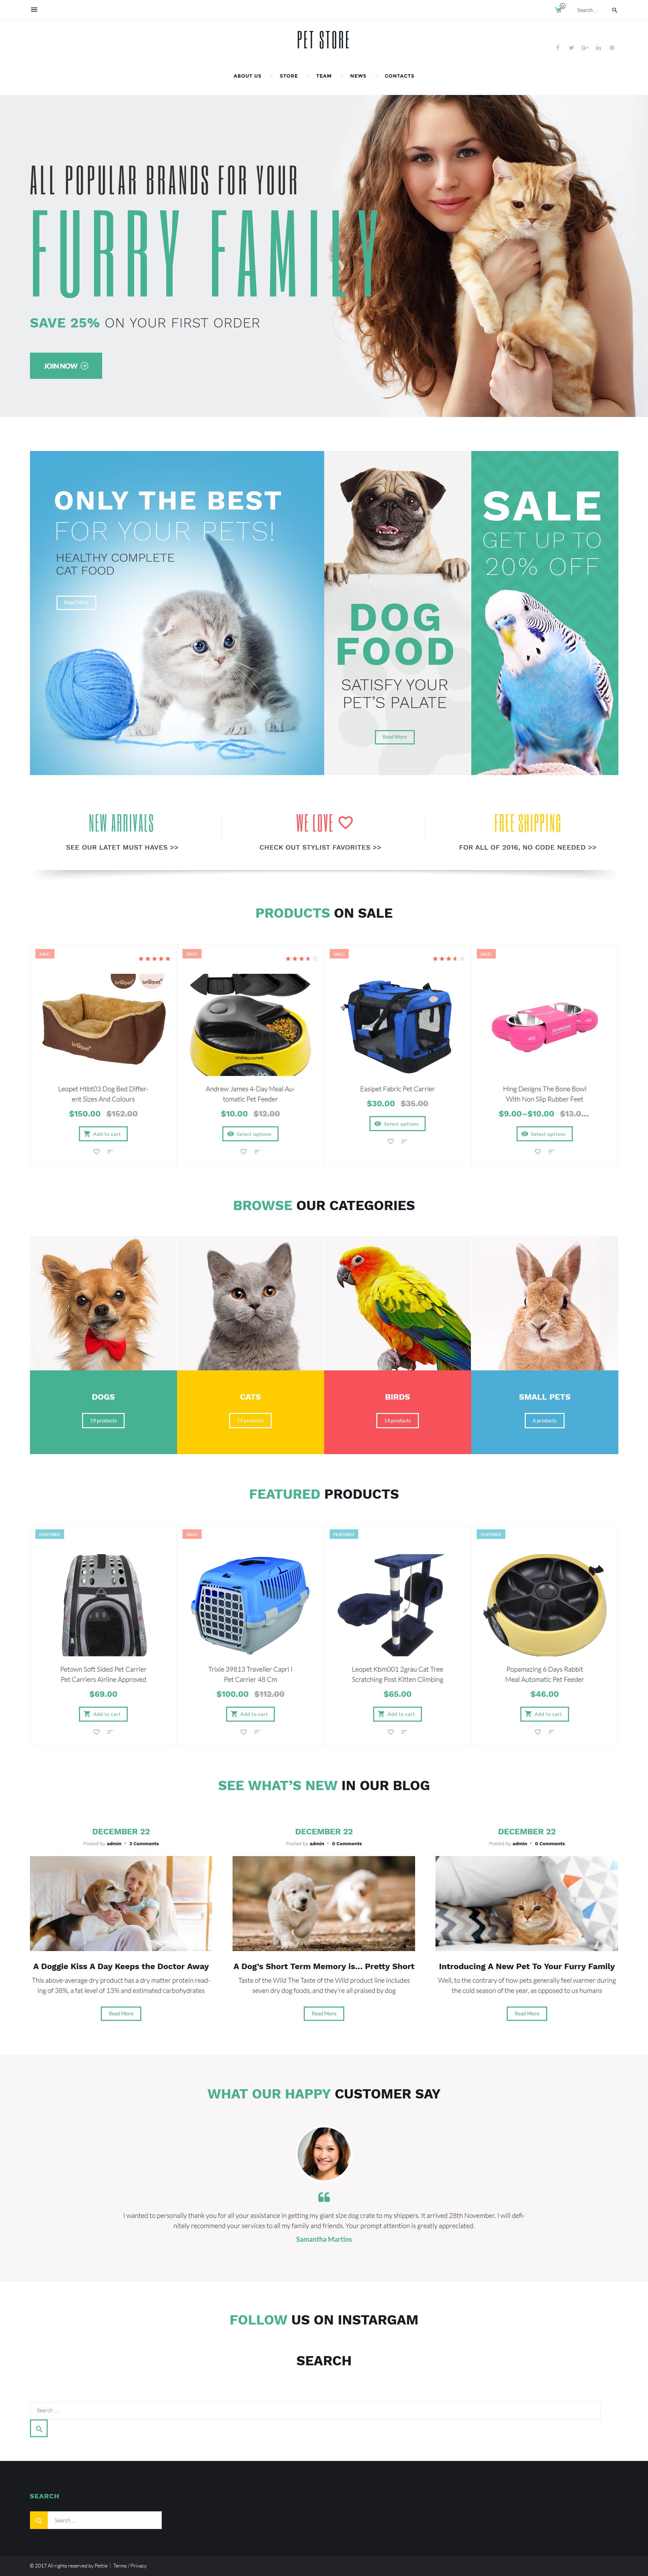 Loja de animais - Tema WooCommerce Responsivo Gratuito Para Lojas de Animais Tema WooCommerce №58660 - captura de tela